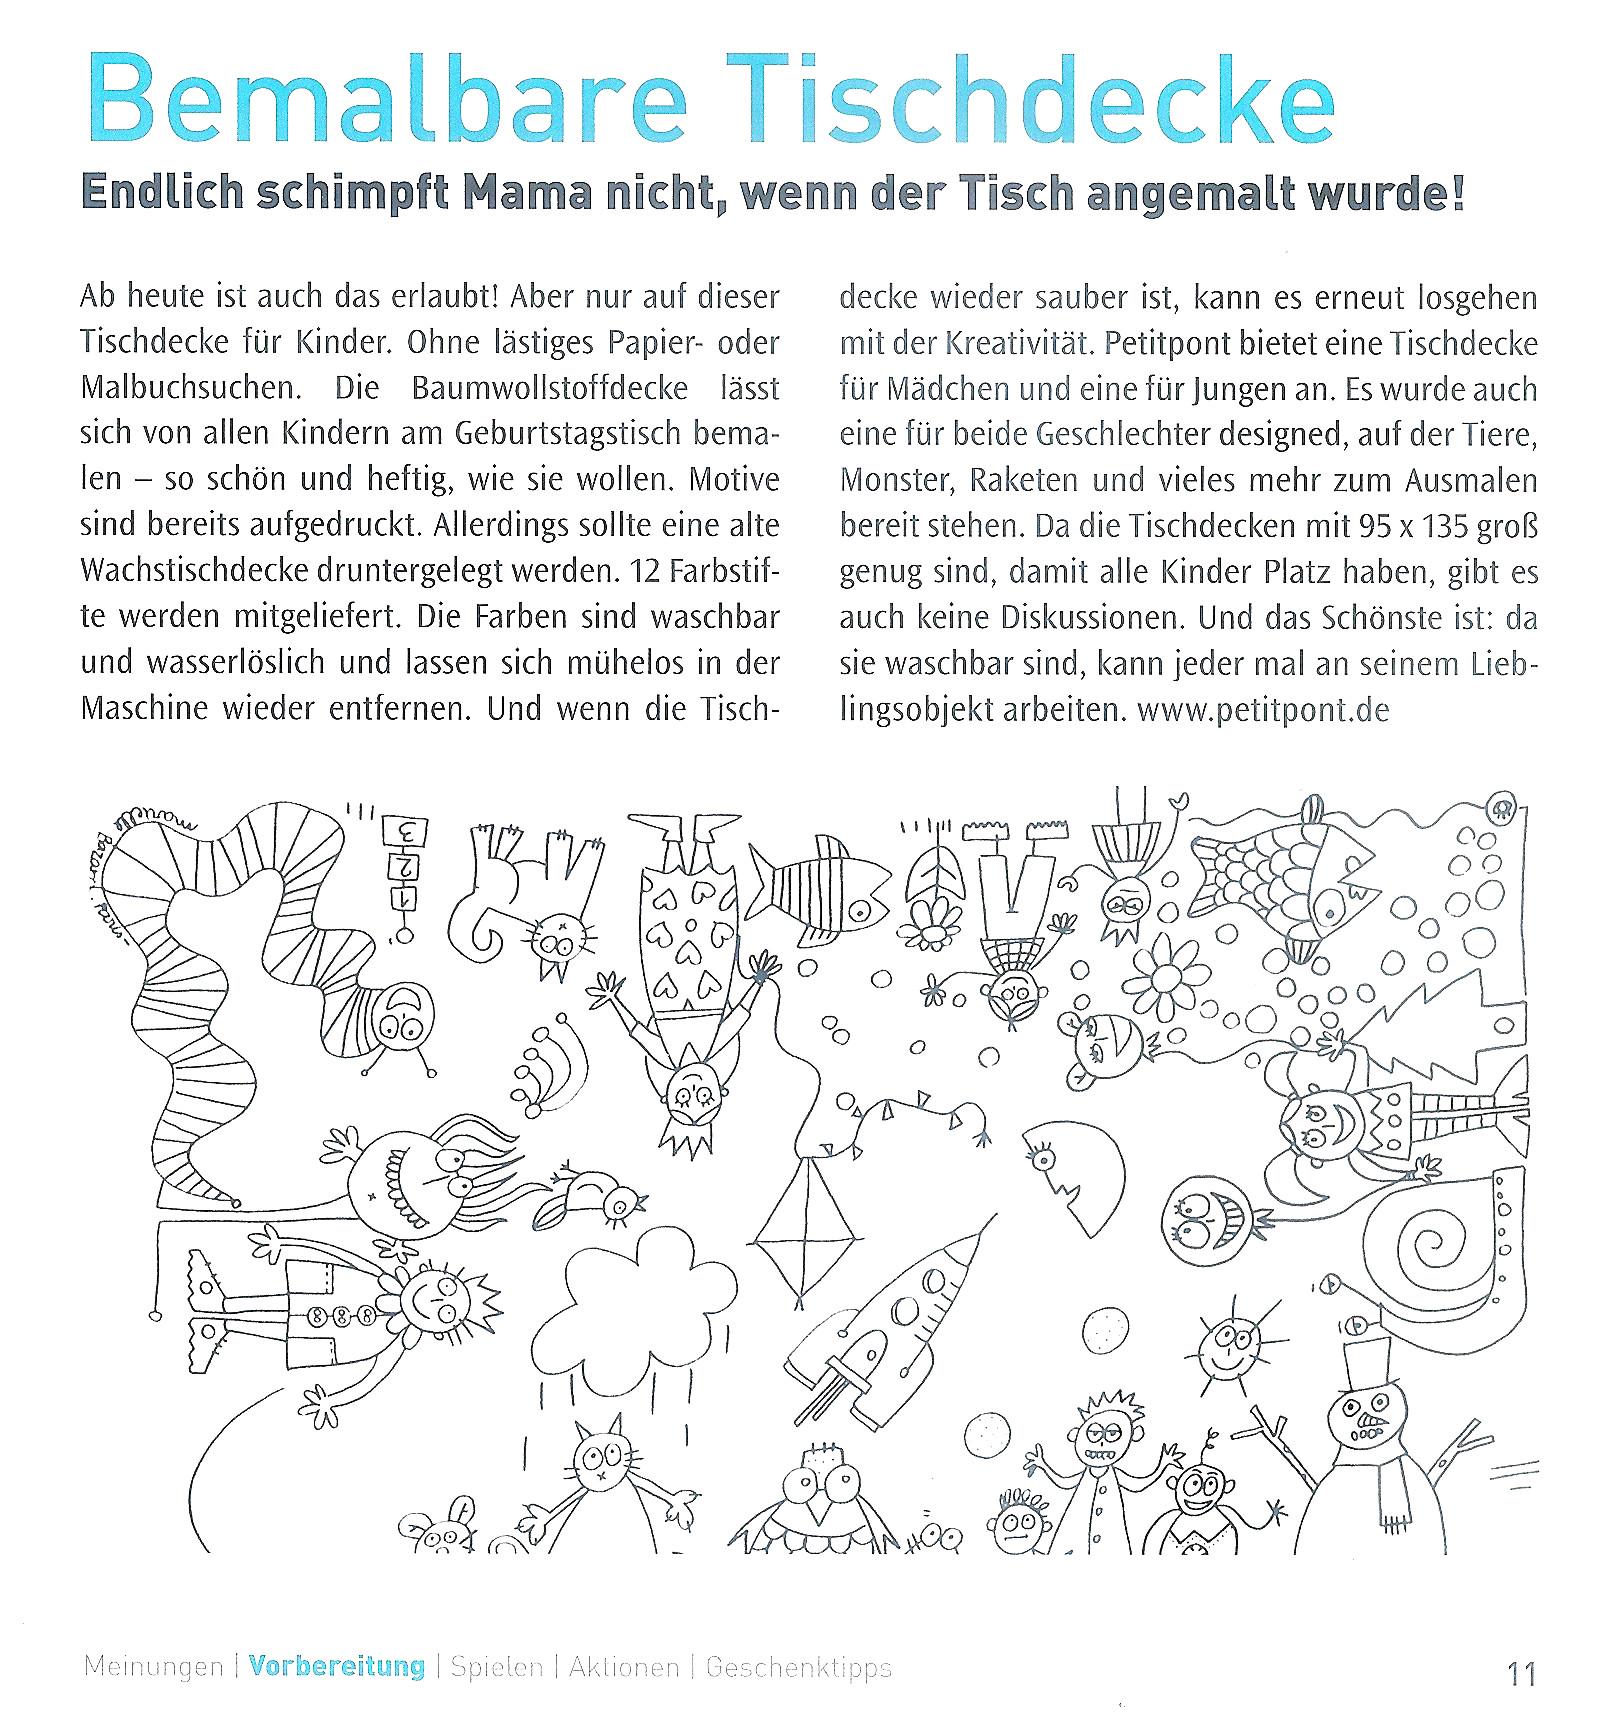 Label Tour- bemalbare Tischdecke, Copyright Clic Clac Verlag